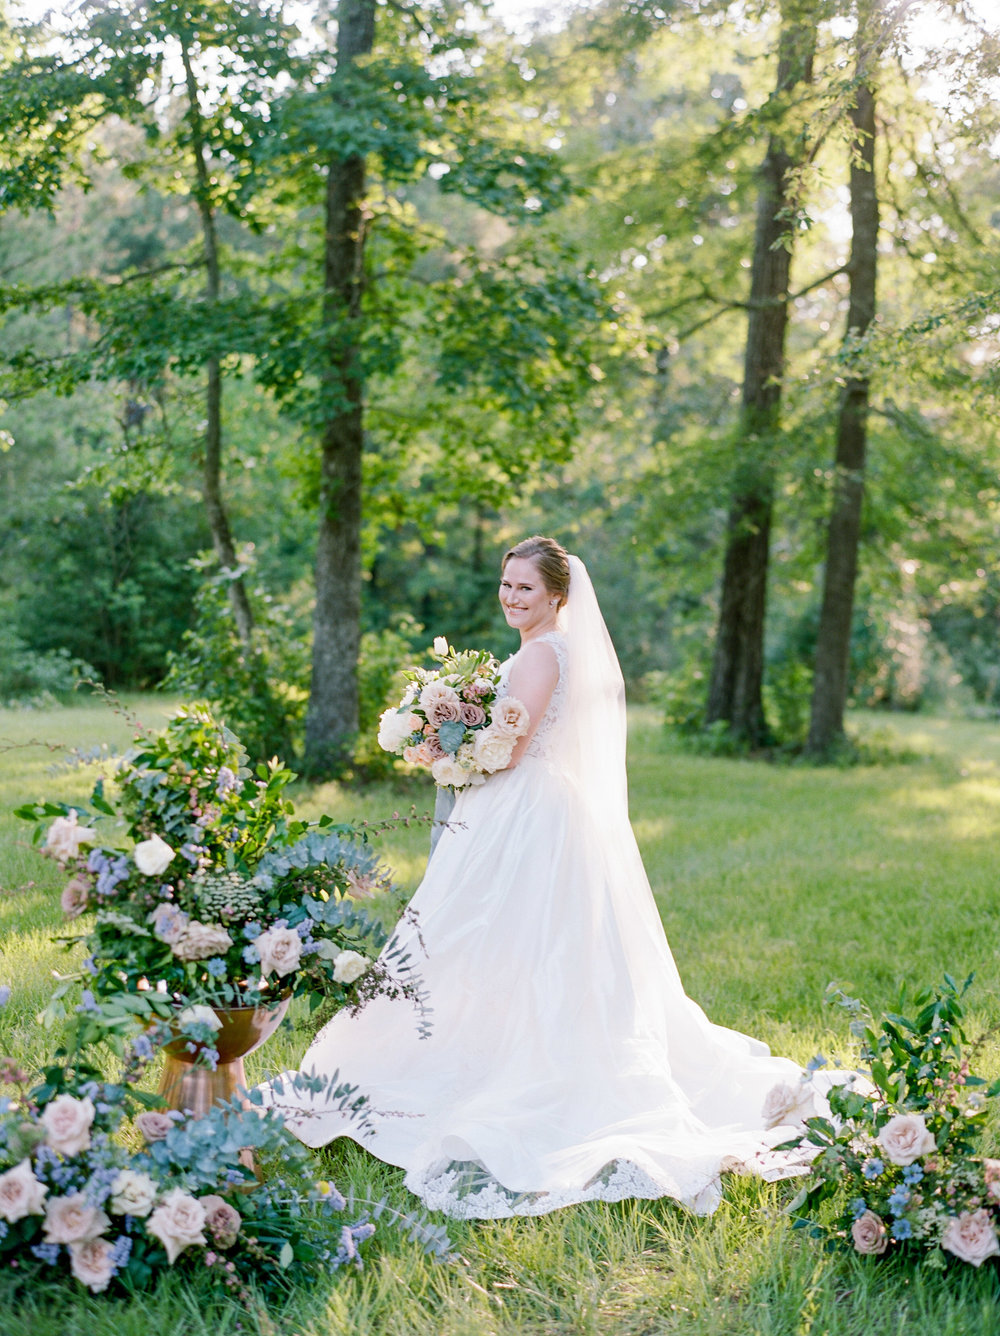 Houston-Fine-Art-Film-Destination-Wedding-Photographer-Top-Best-Luxury-Josh-Dana-Fernandez-Photographer-Austin-Texas-7.jpg